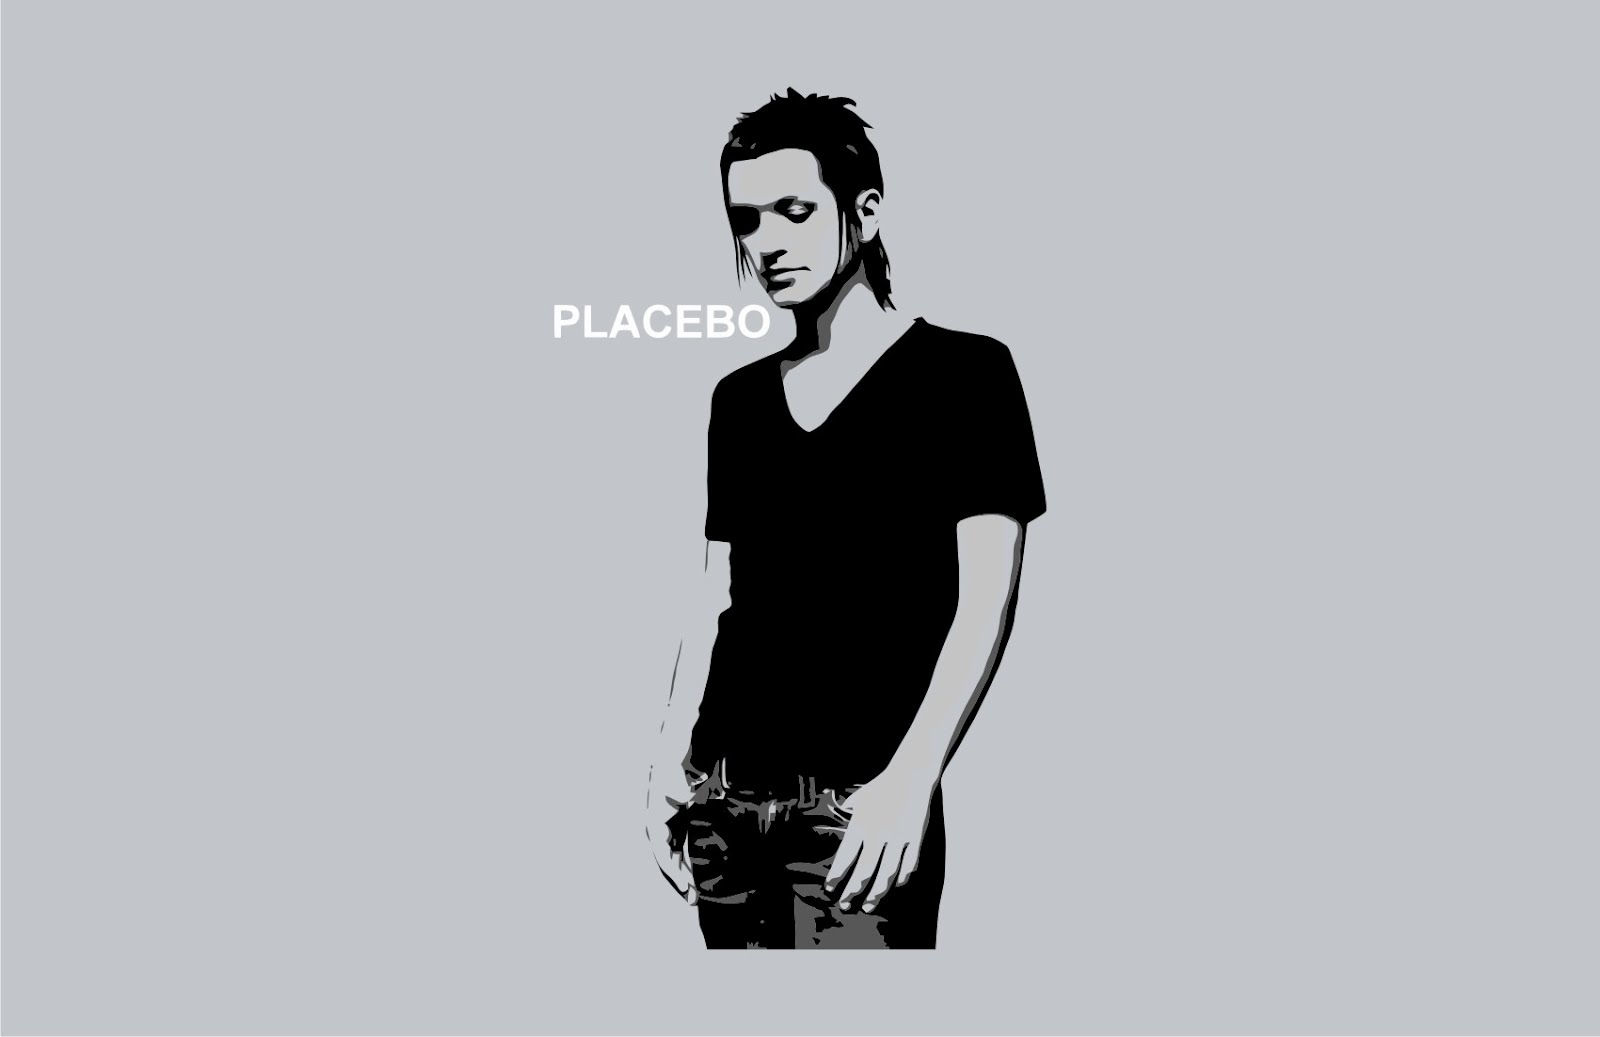 placebo-brian_molko_front_vector